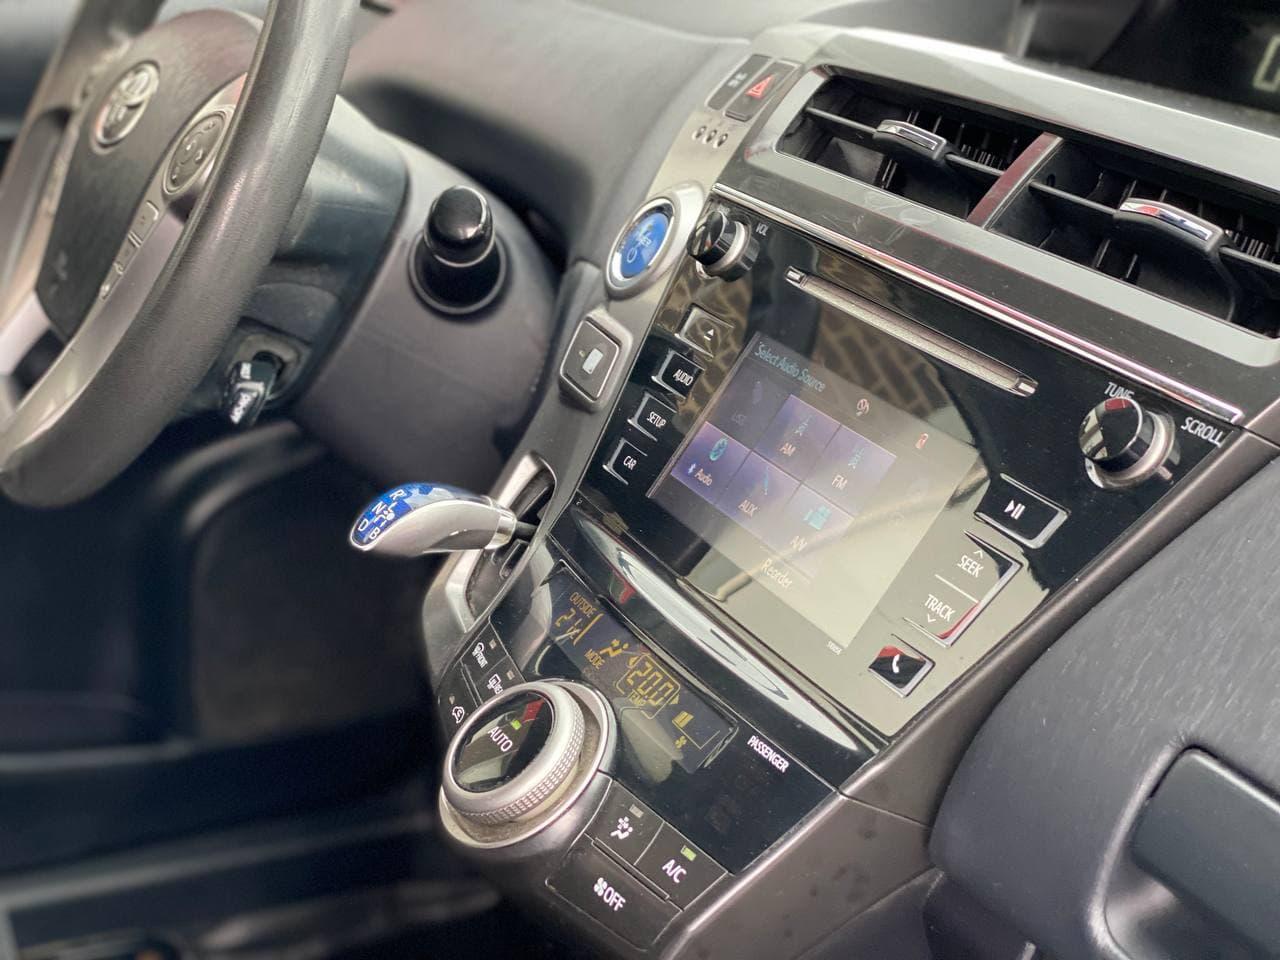 Toyota Prius V Hybrid Рестайлинг 2015 года! Расход бензина по городу 4.8 литра на 100 км! Возмонжна установка ГБО! full